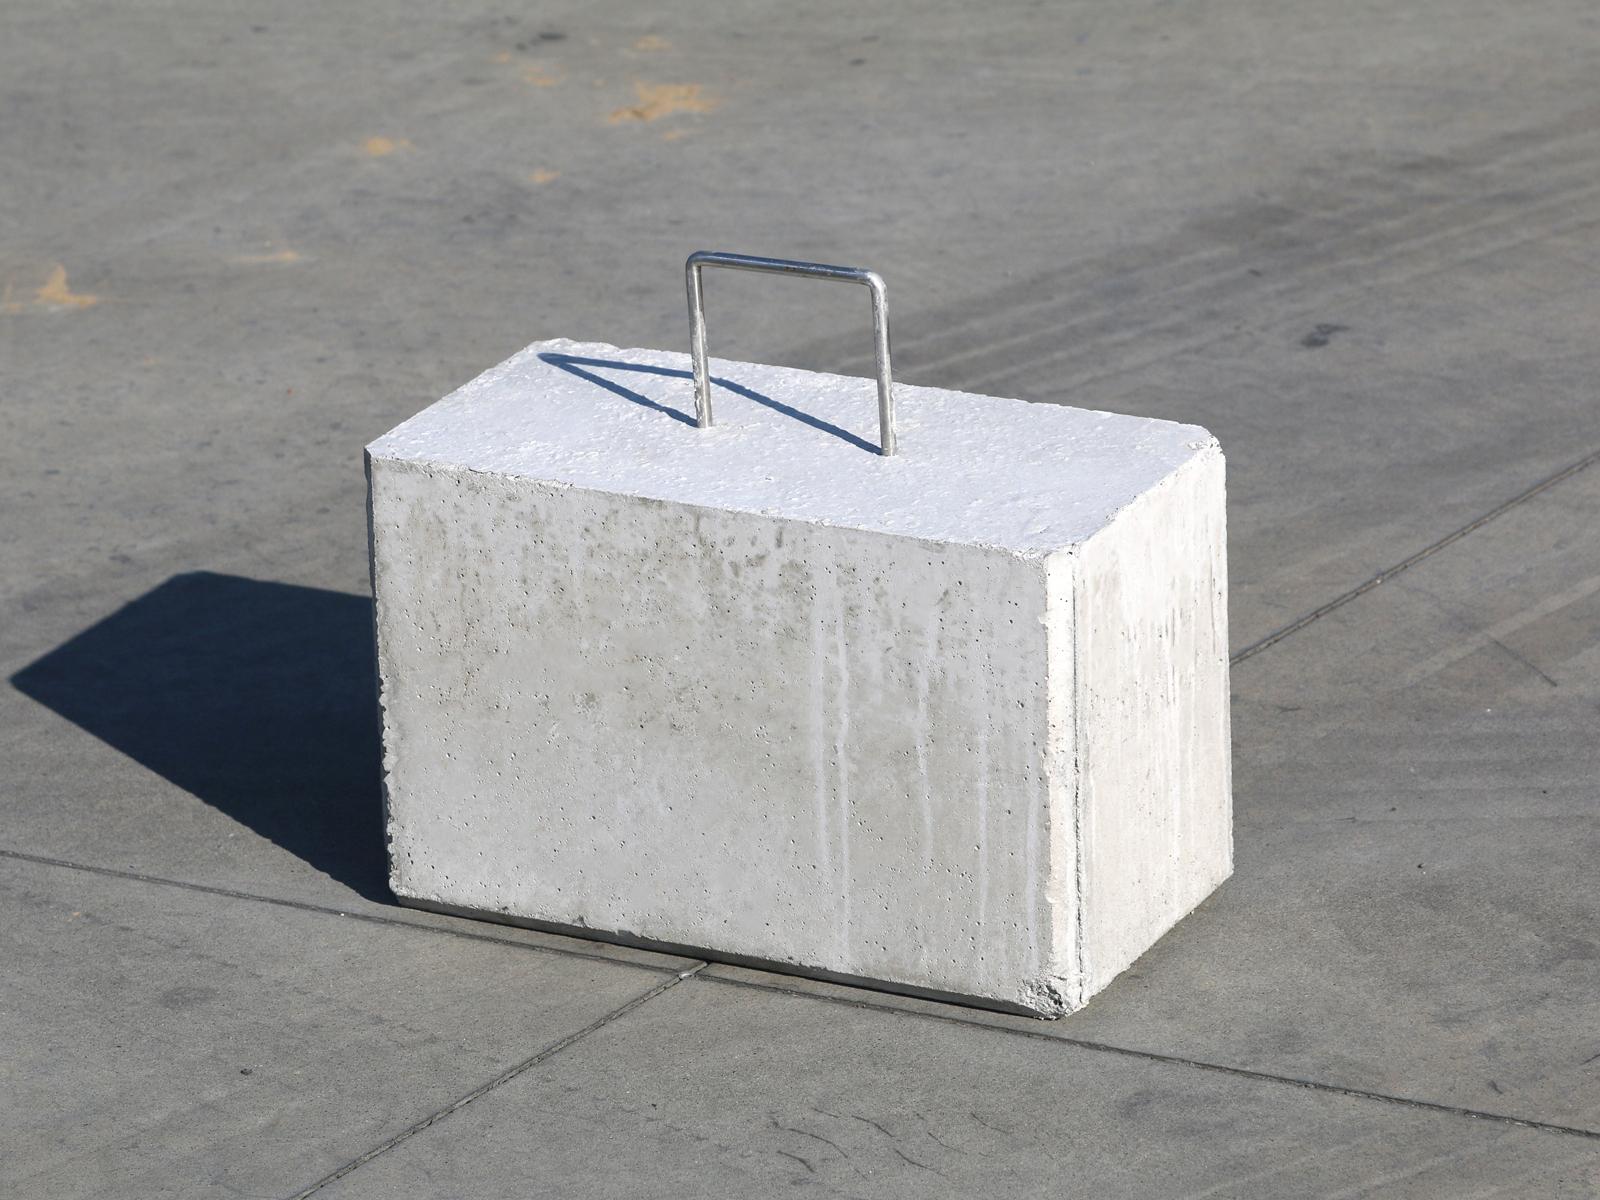 betonblok 45 kg koop makkelijk online handgreep om te. Black Bedroom Furniture Sets. Home Design Ideas